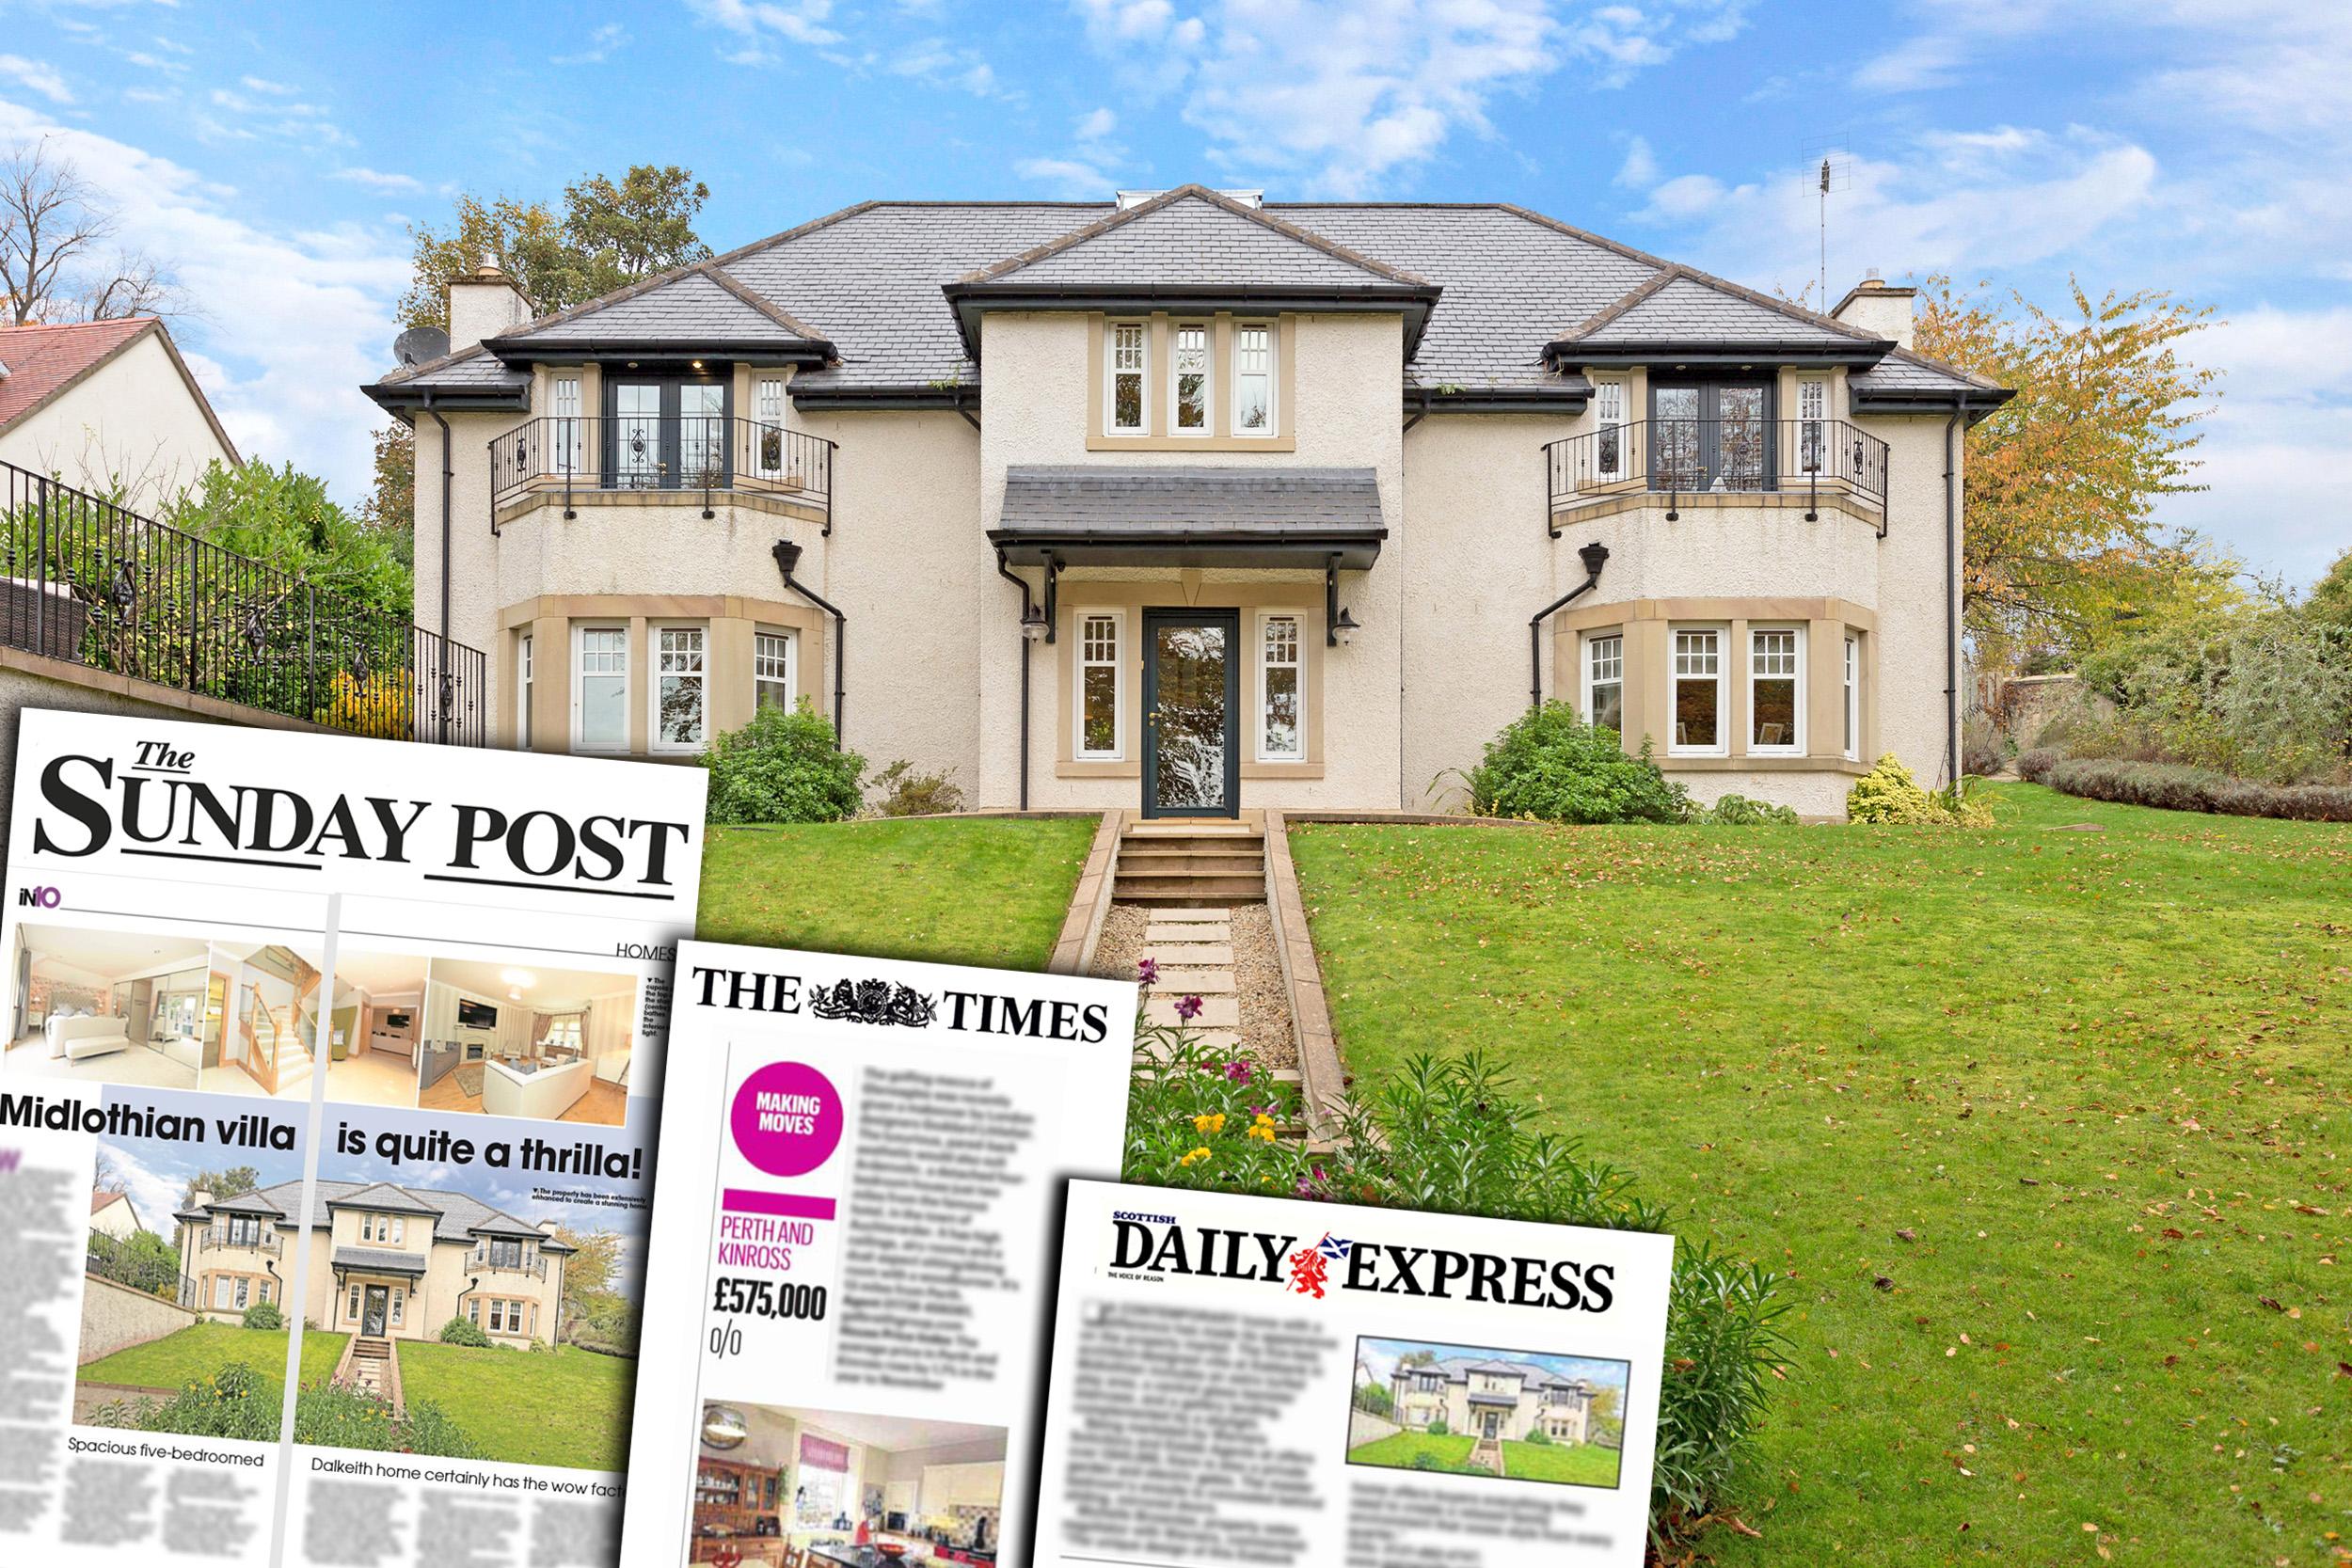 Stunning Eskbank Villa property PR success